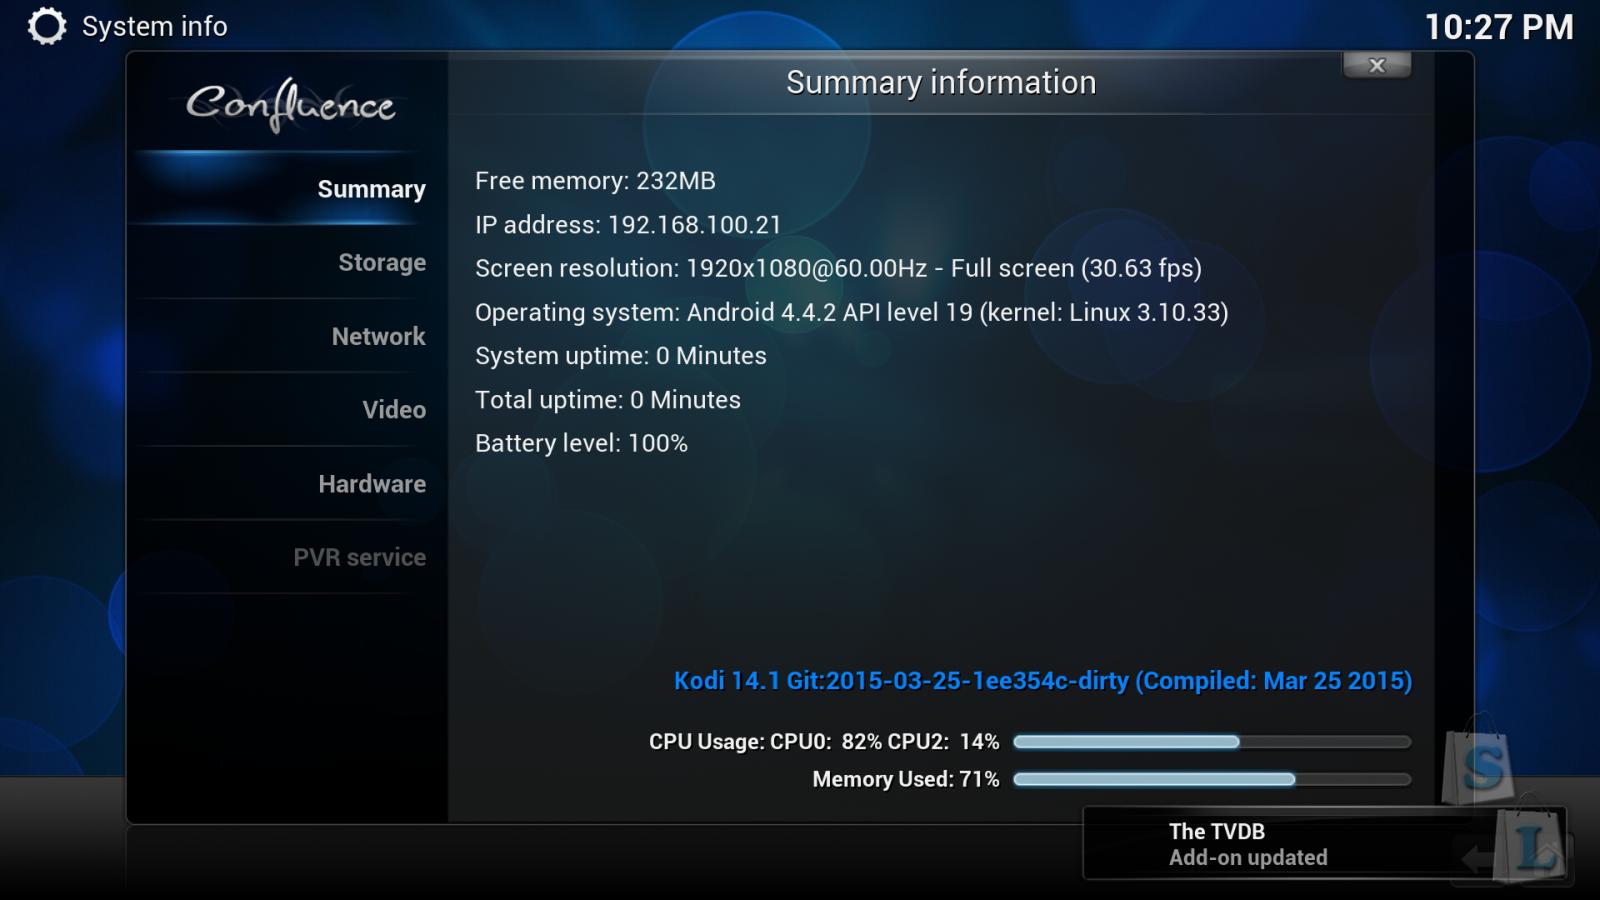 Geekbuying: Обзор Tronsmart MXIII Amlogic S802 2.0GHz Quad Core медиаприставка на Android